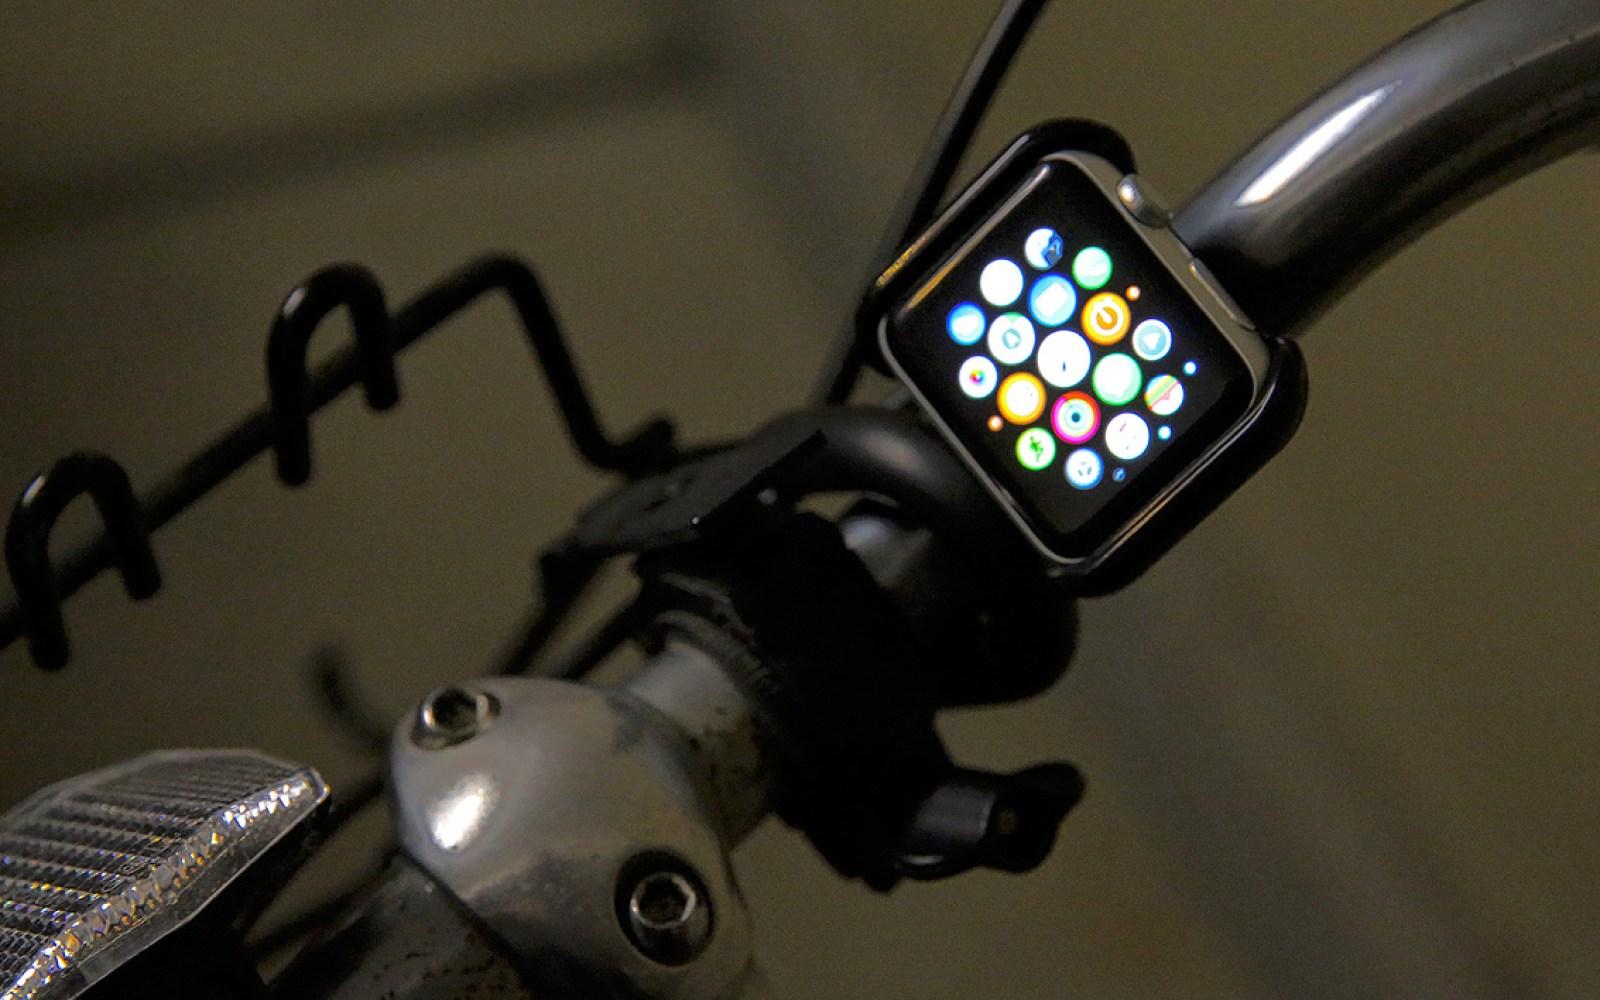 Satechi's Apple Watch Grip Mount plays music, shows notifications from steering wheels or bike handlebars